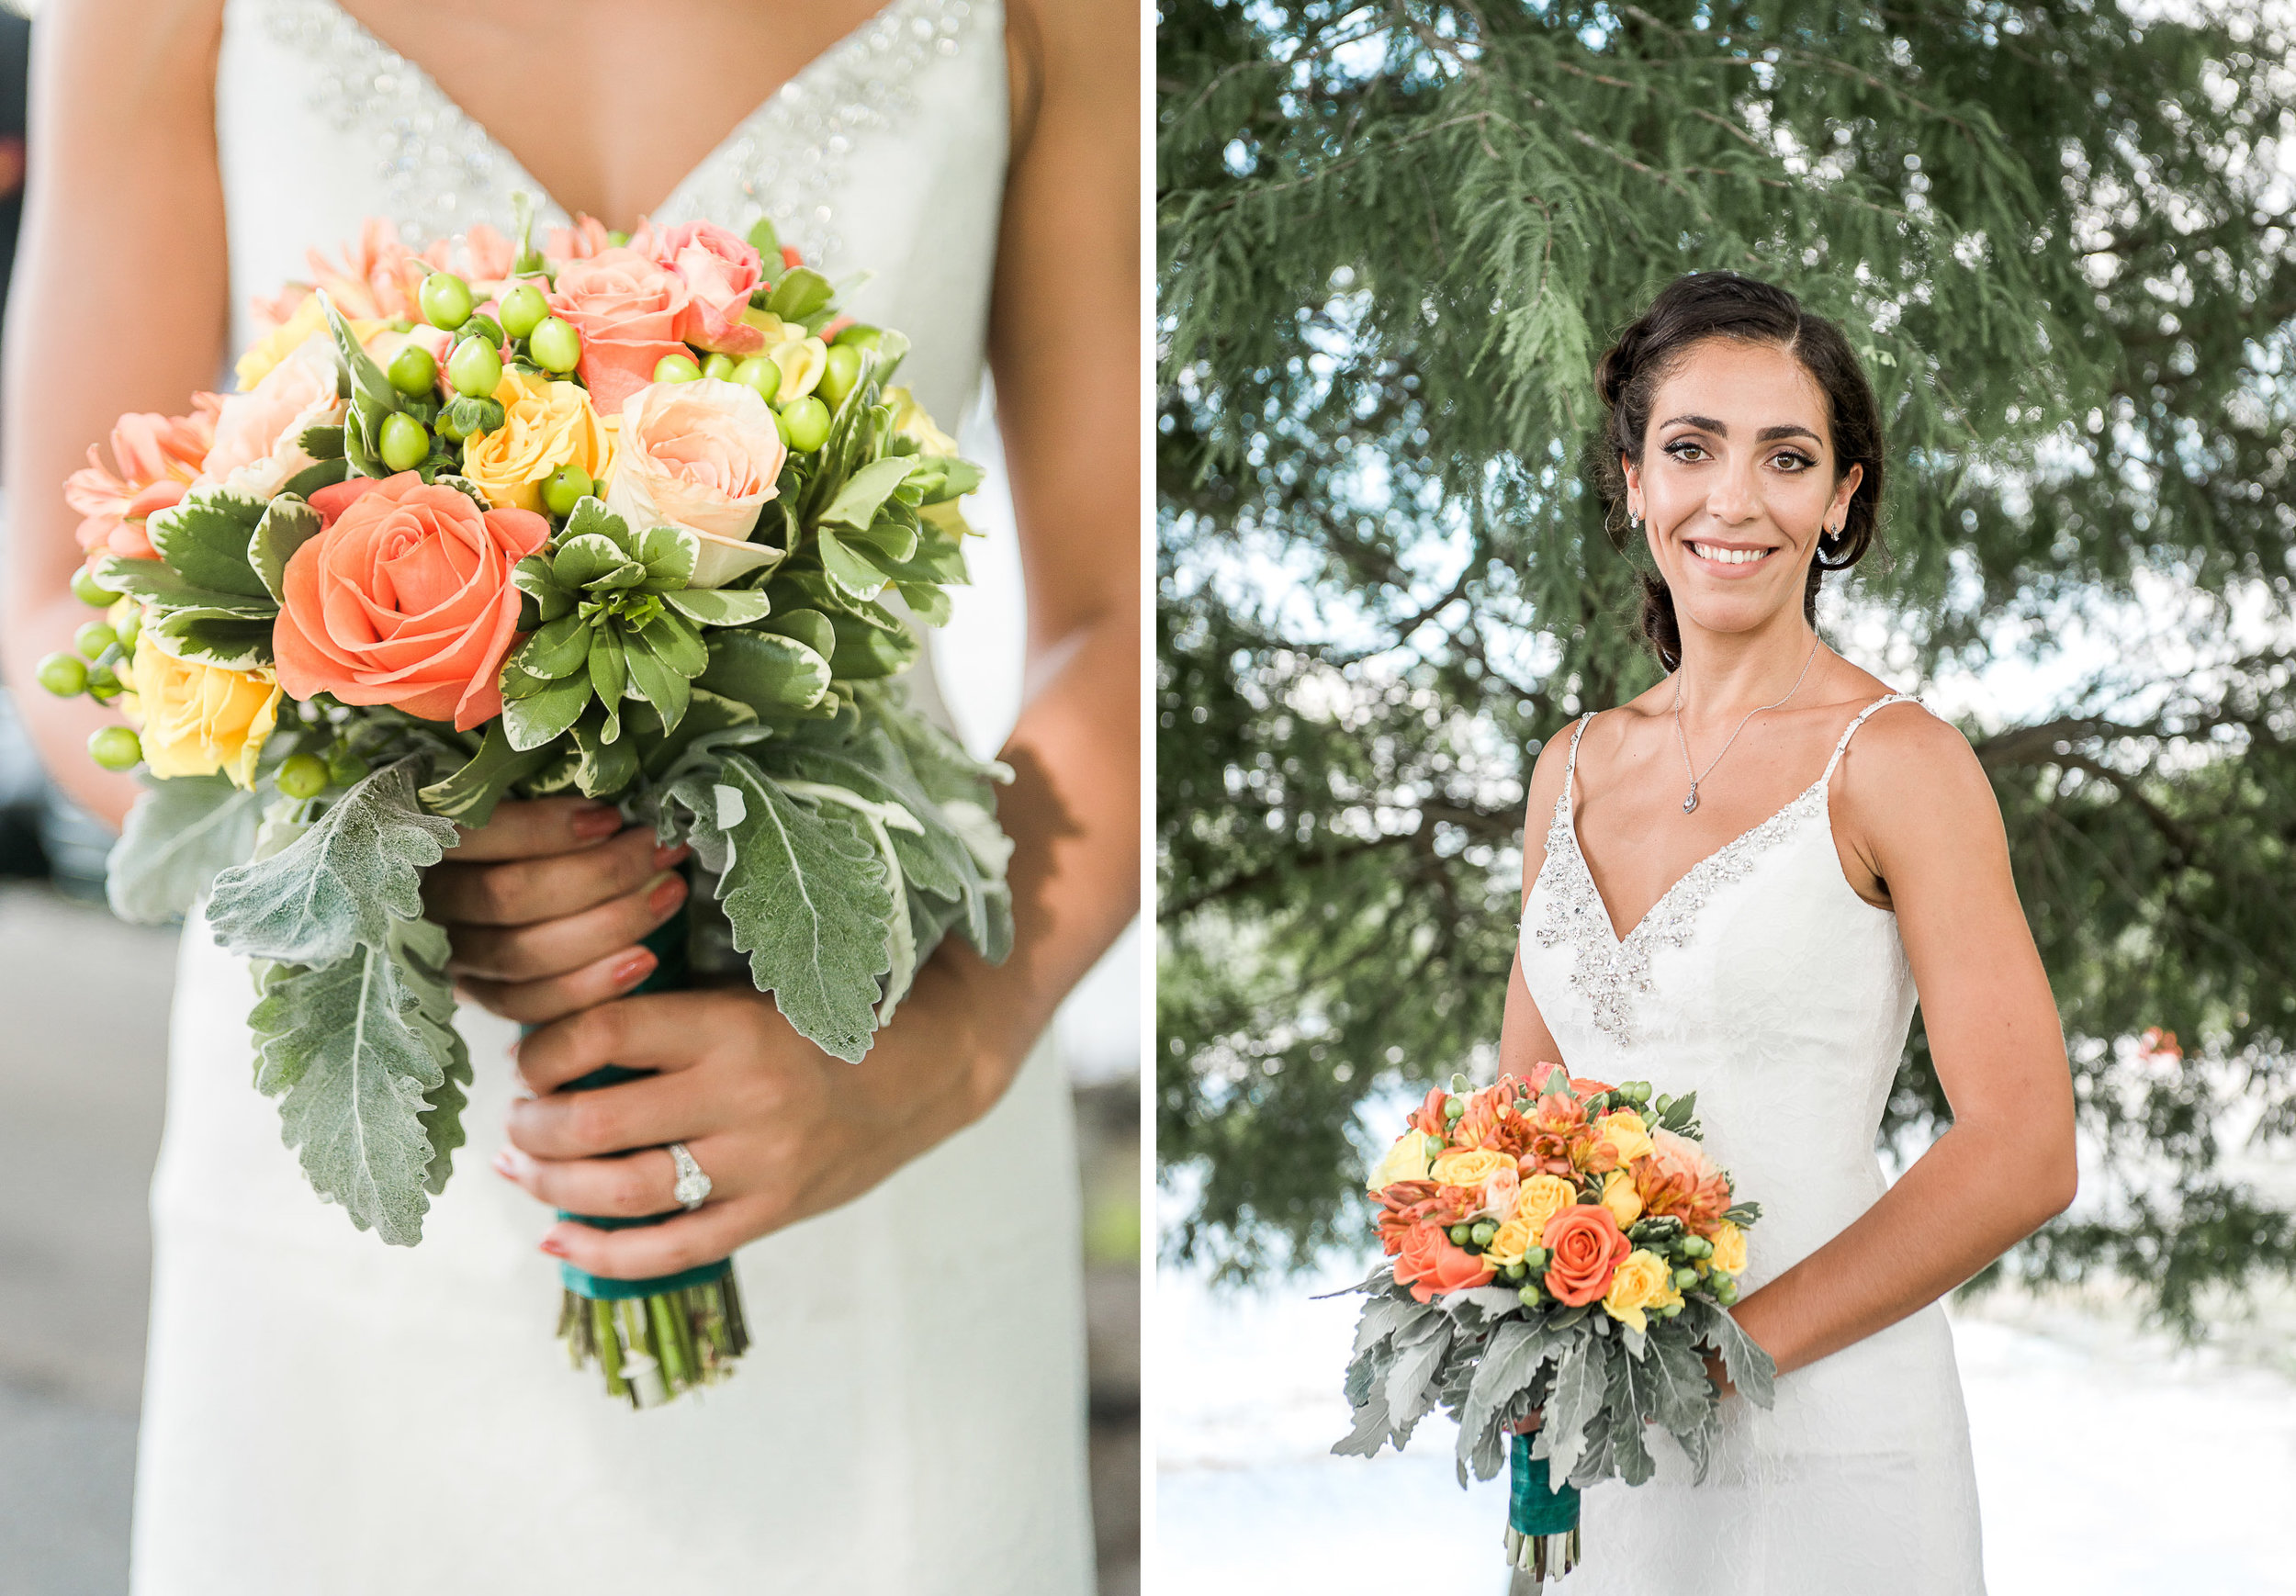 KateTaramykinStudios-Kissimmee-Wedding-Arzola-13.jpg